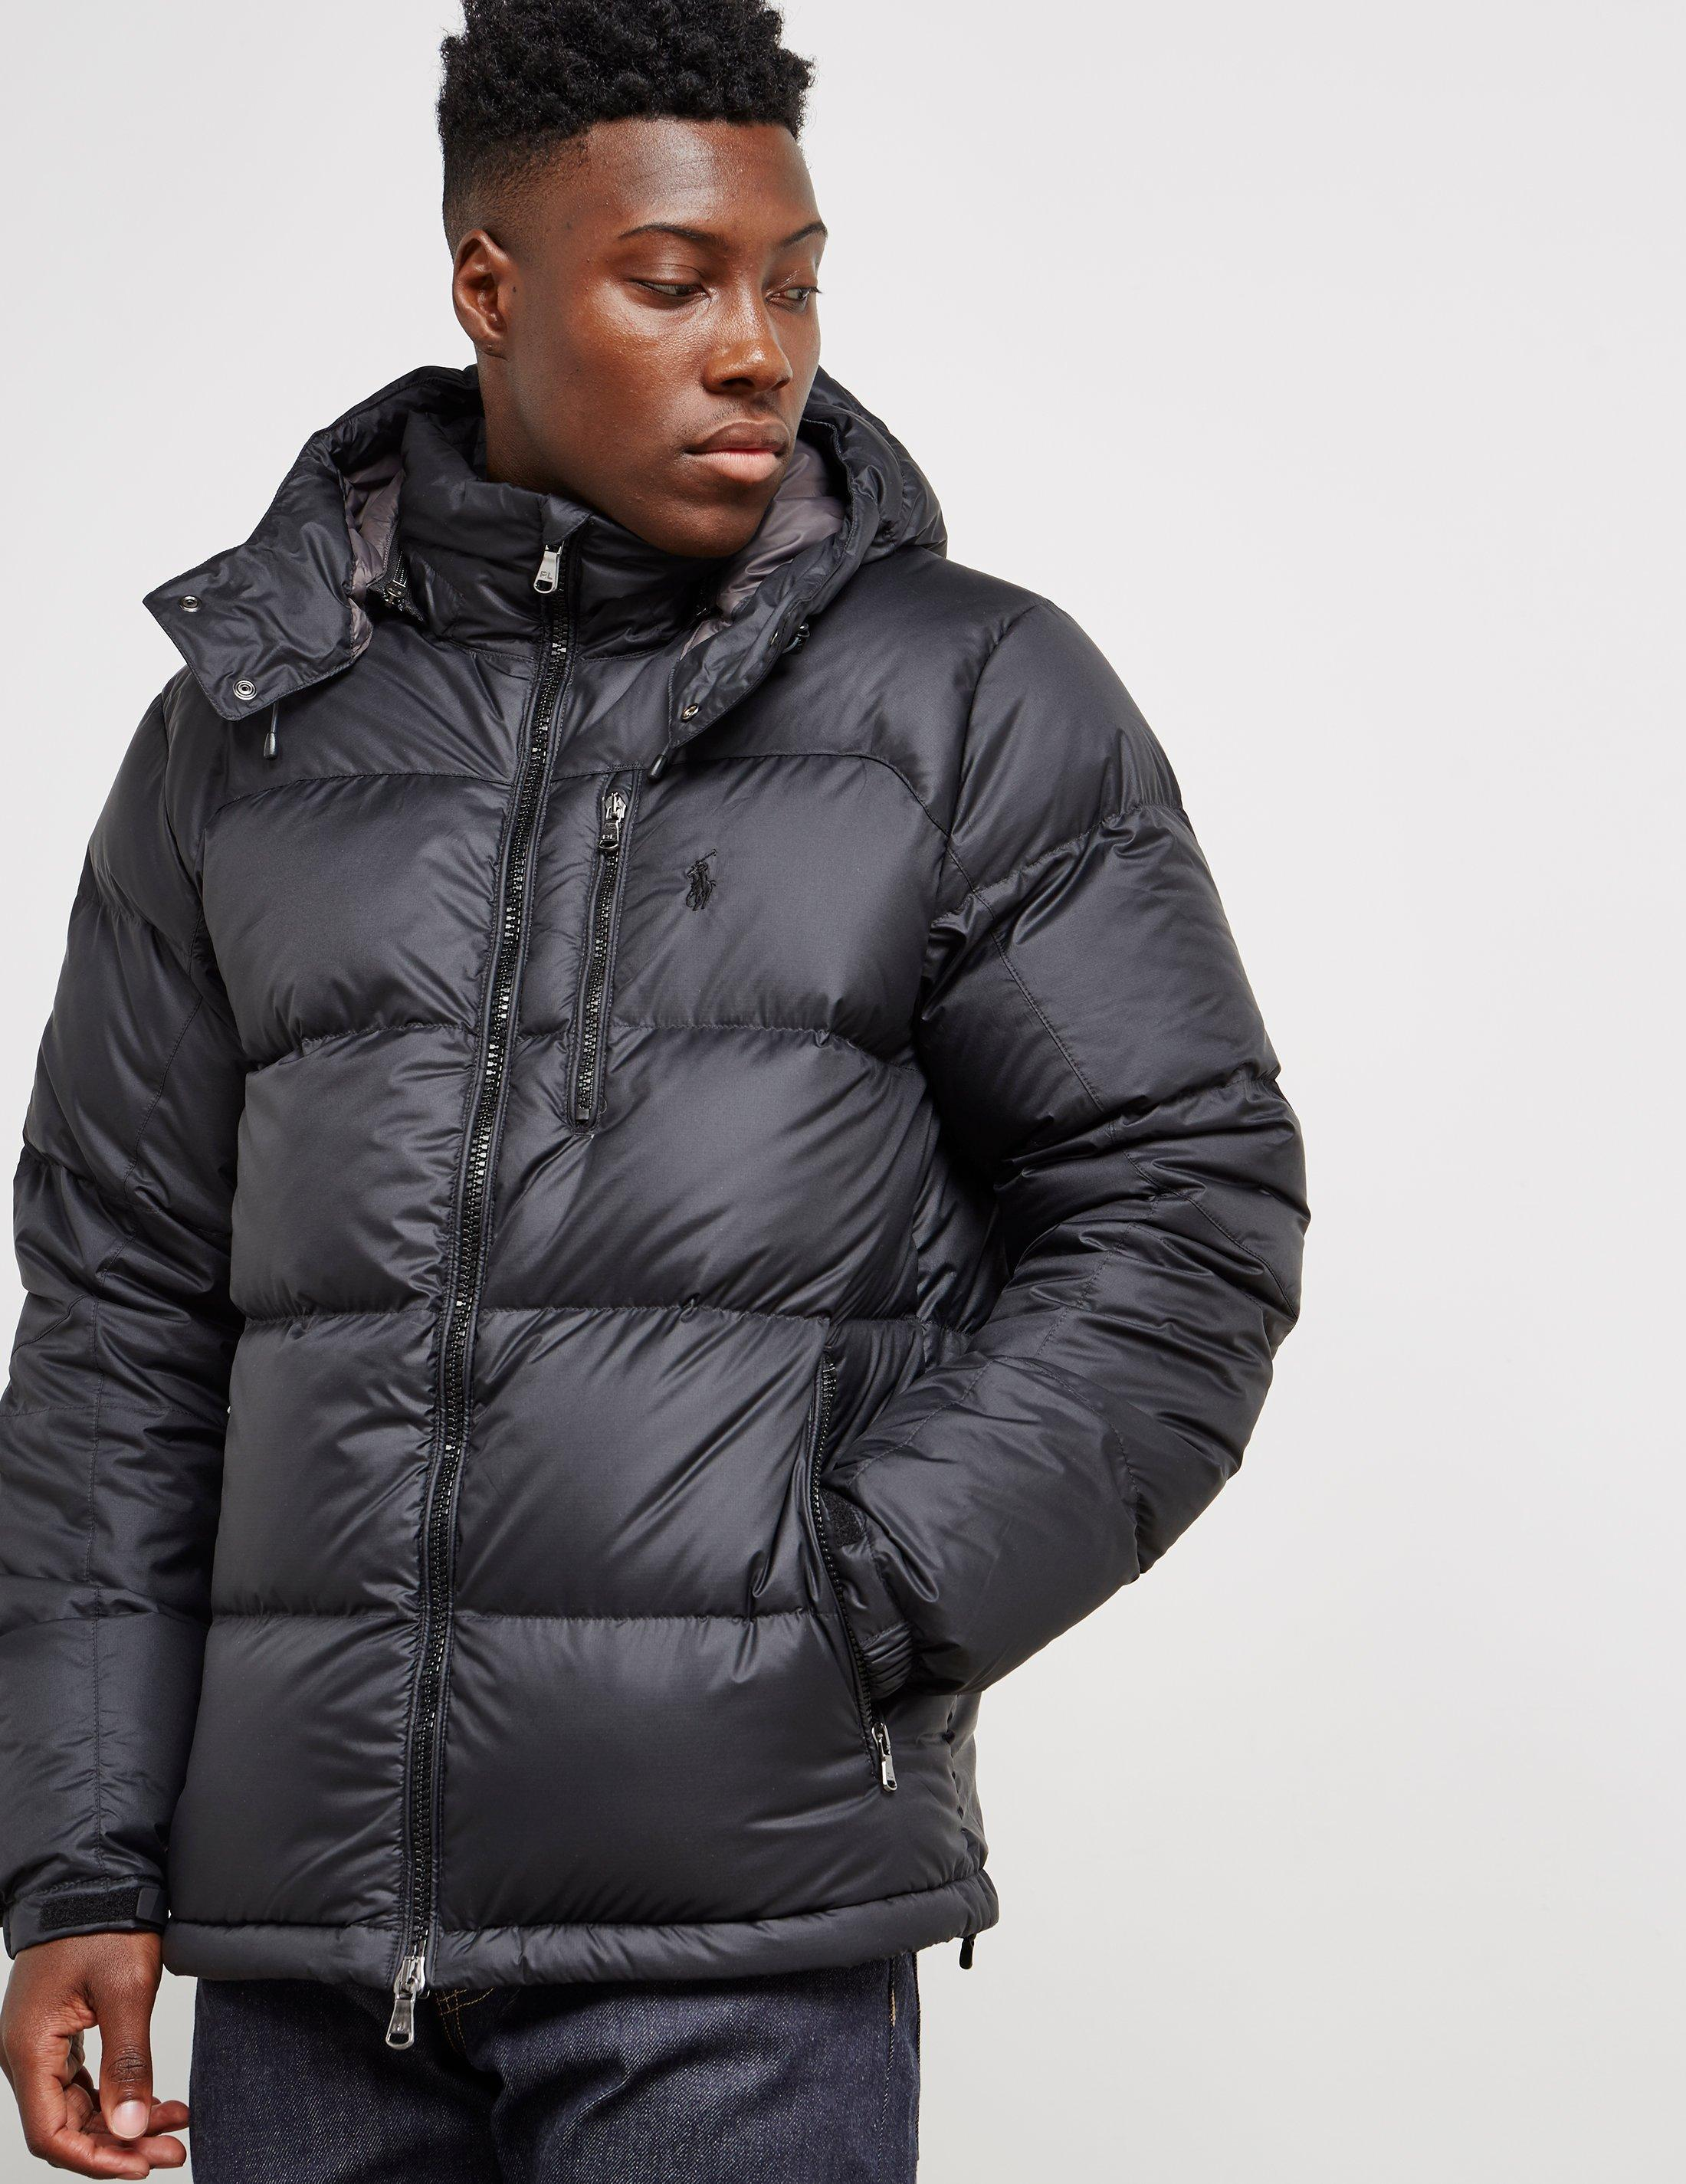 5000d56769f8 Lyst - Polo Ralph Lauren Down Padded Jacket Black in Black for Men ...